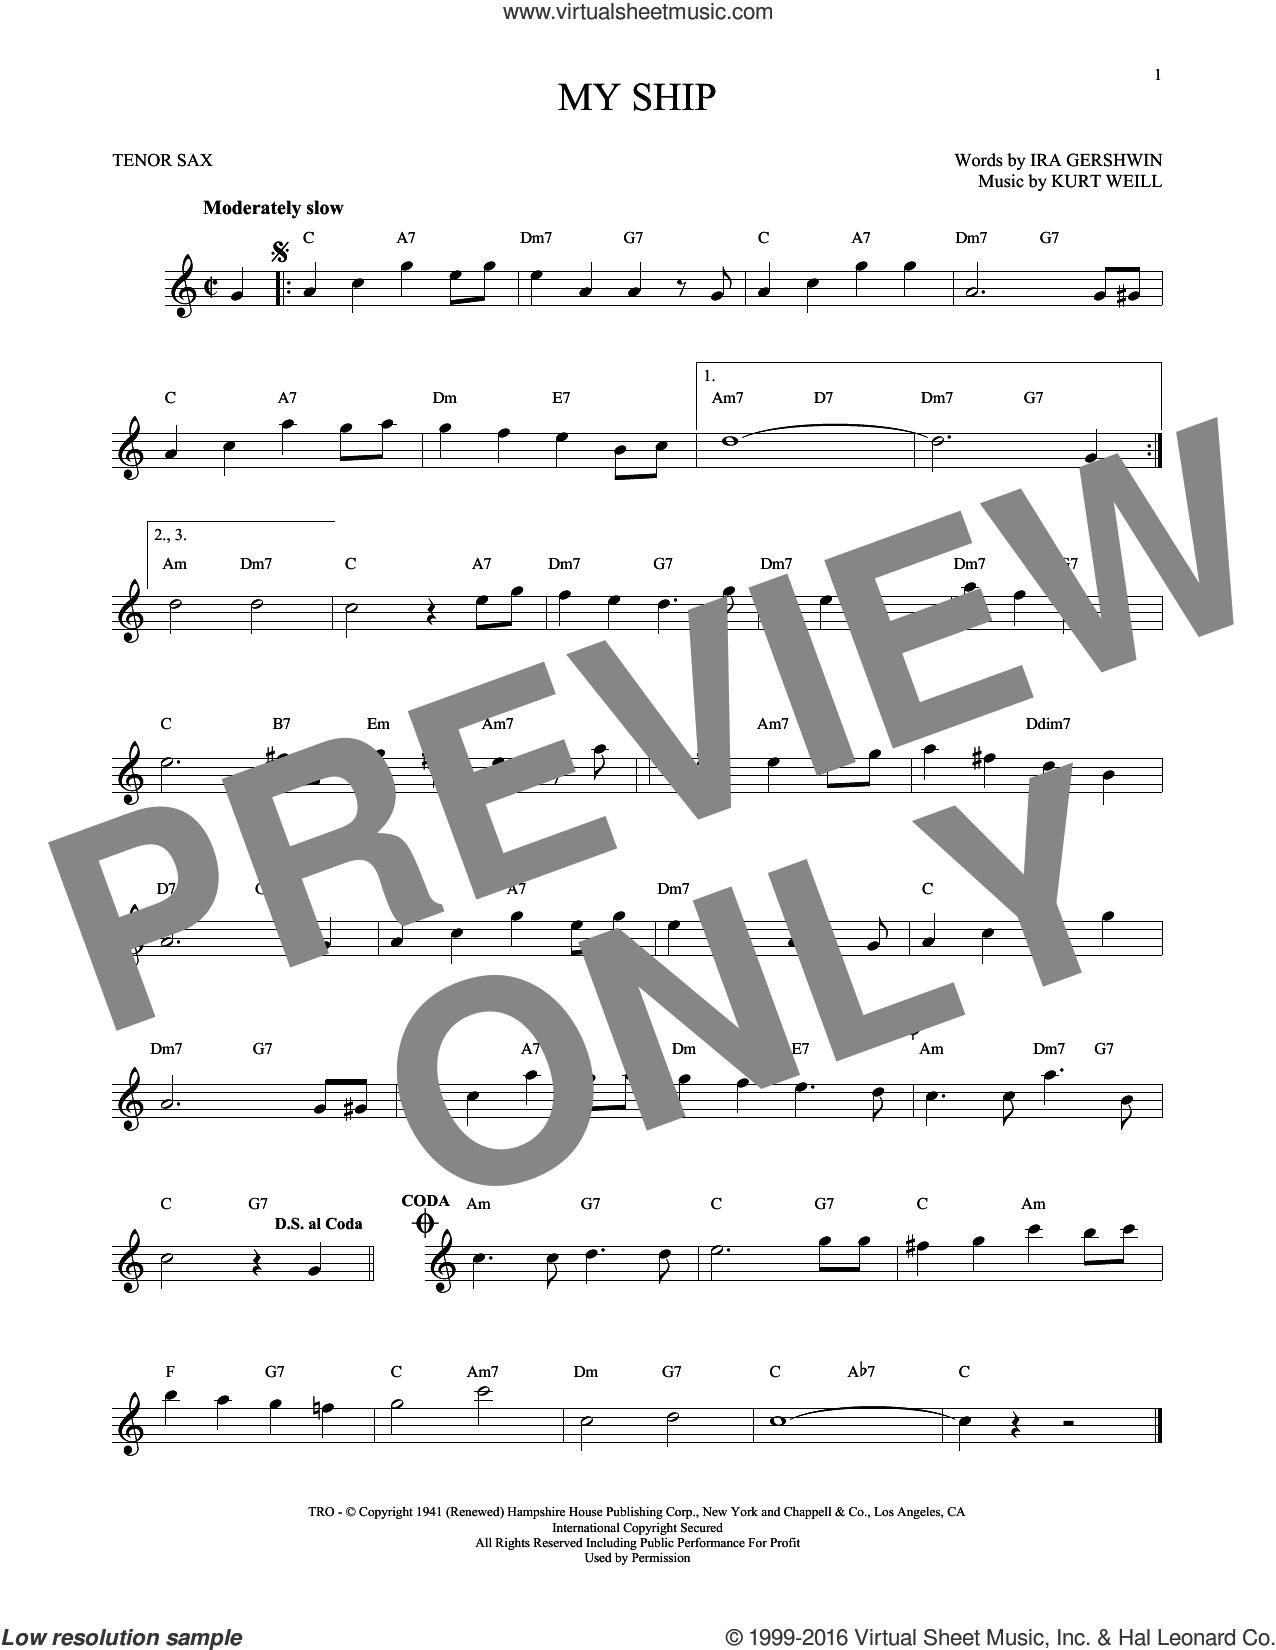 My Ship sheet music for tenor saxophone solo by Ira Gershwin and Kurt Weill, intermediate skill level